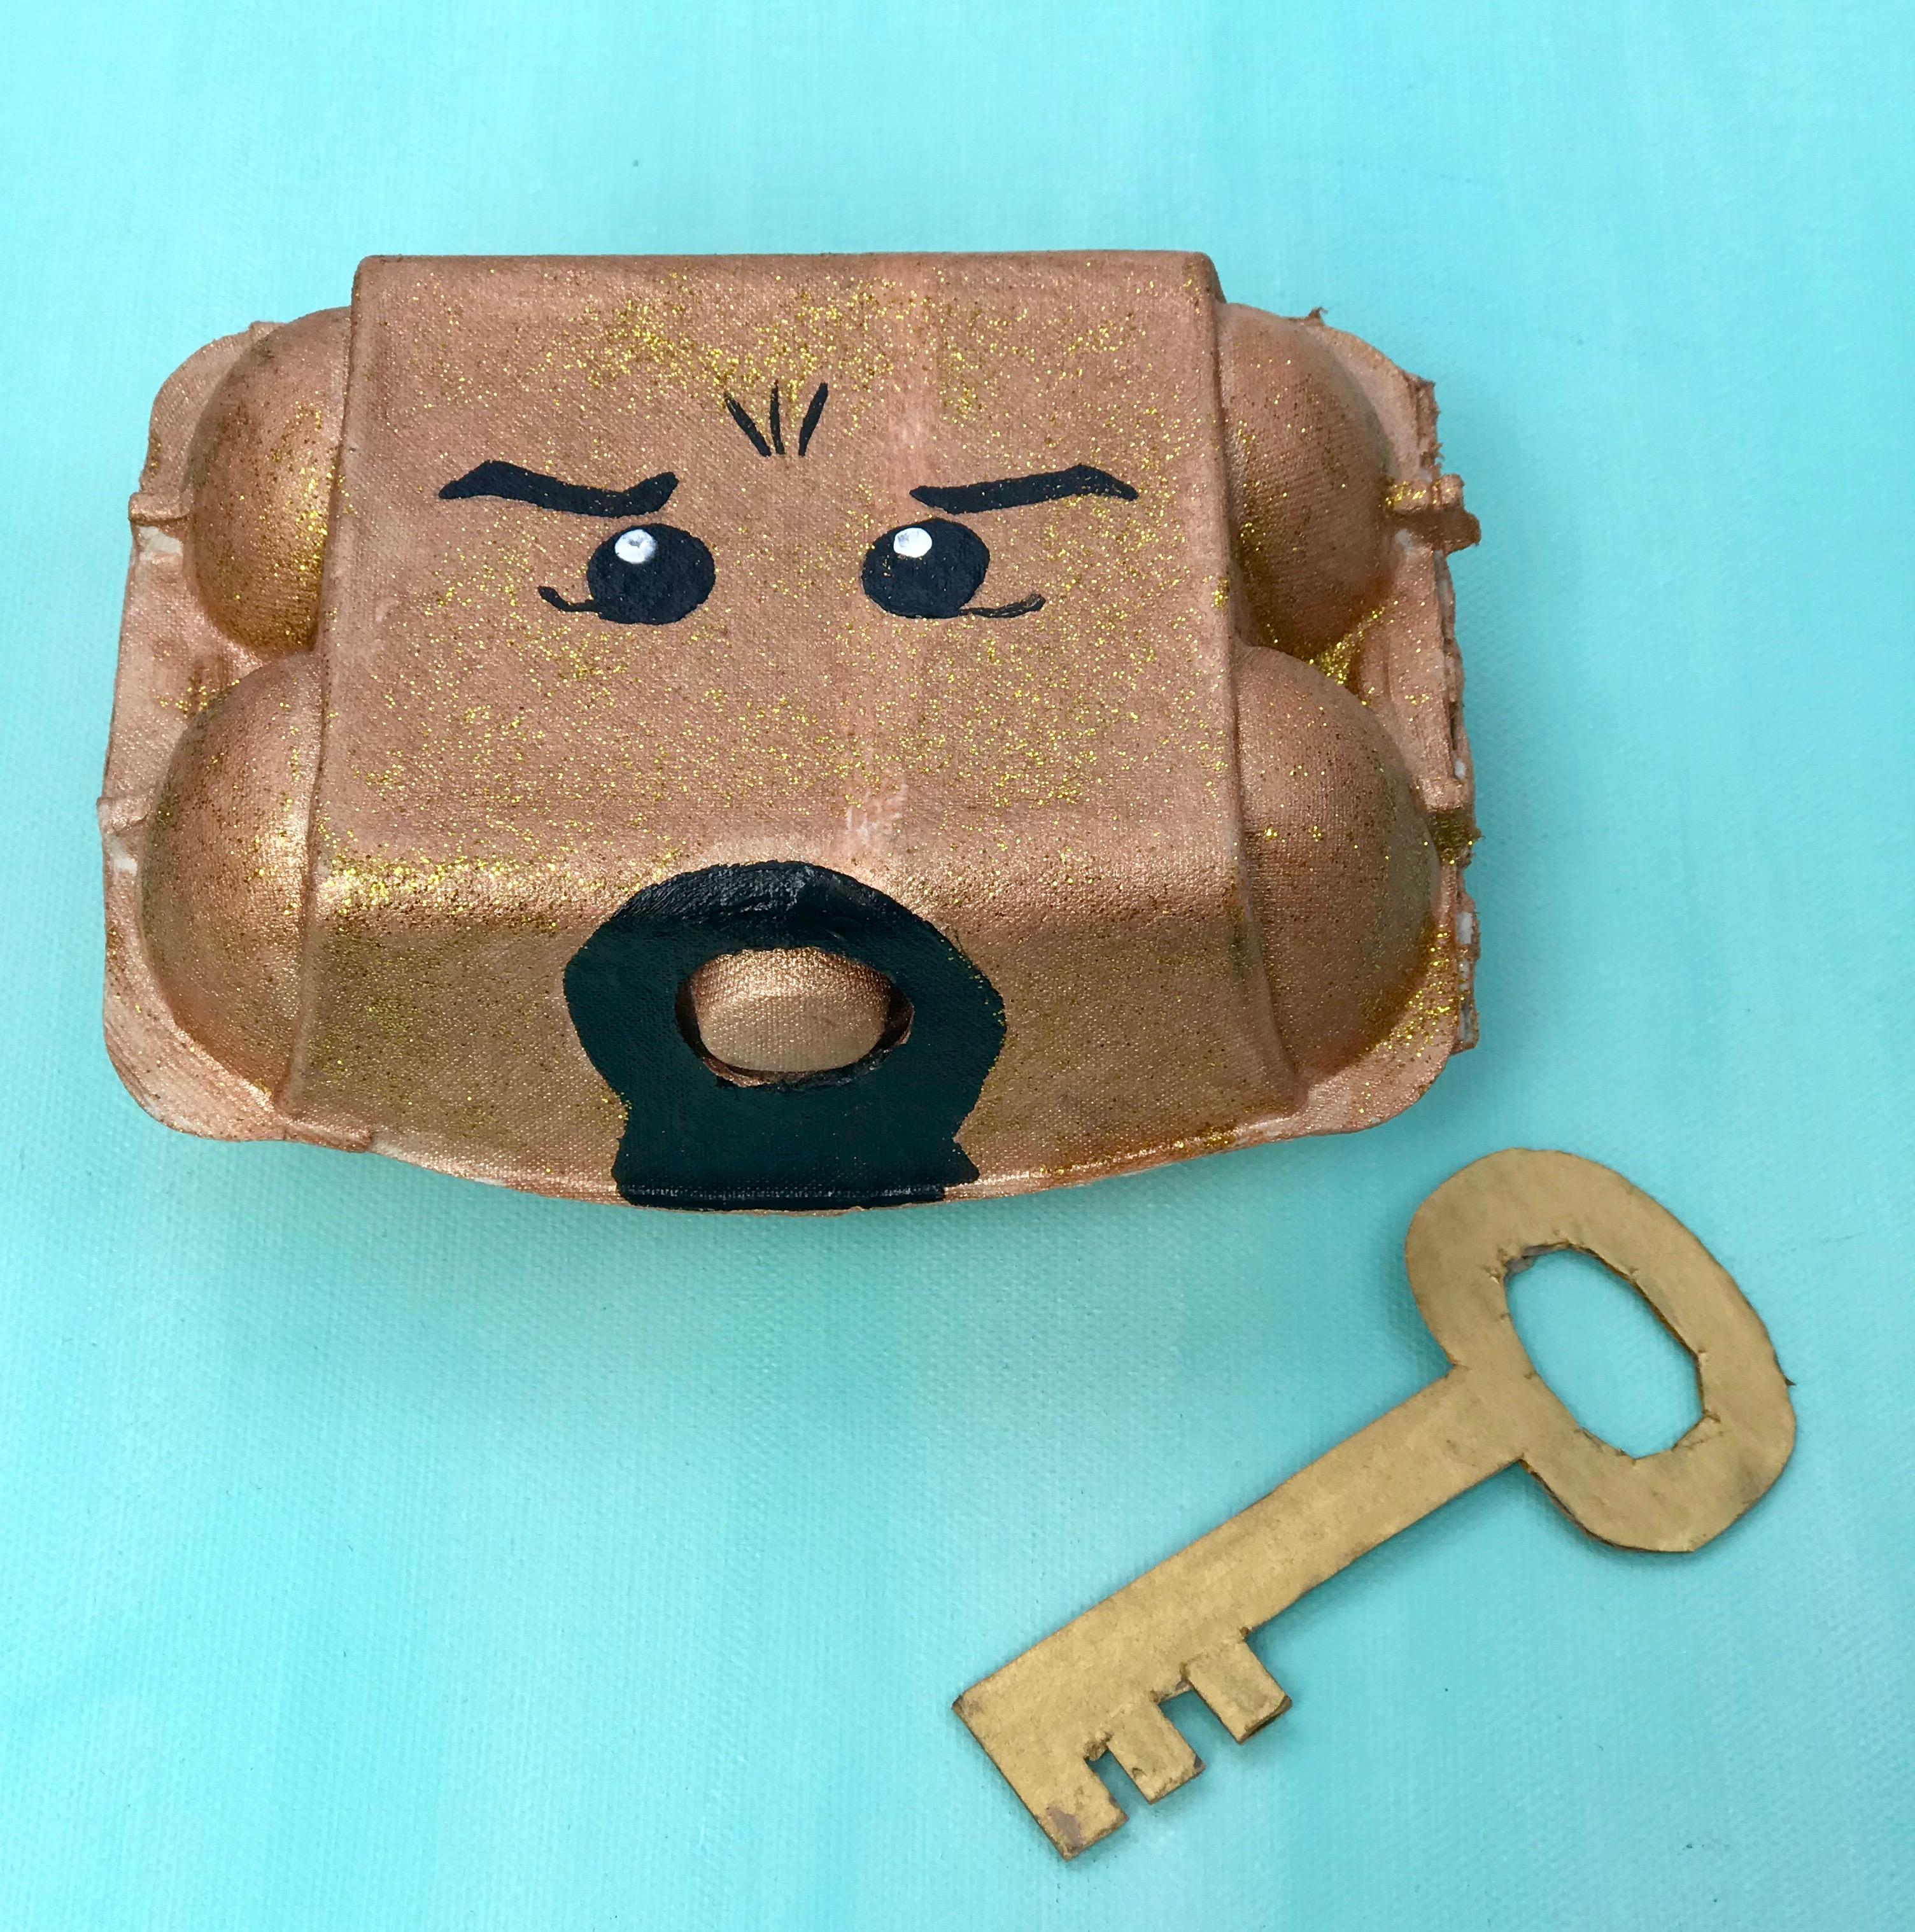 ninjago-geburtstag-spiel-idee-schatztruhe-aus-eierkarton-basteln-upcycling